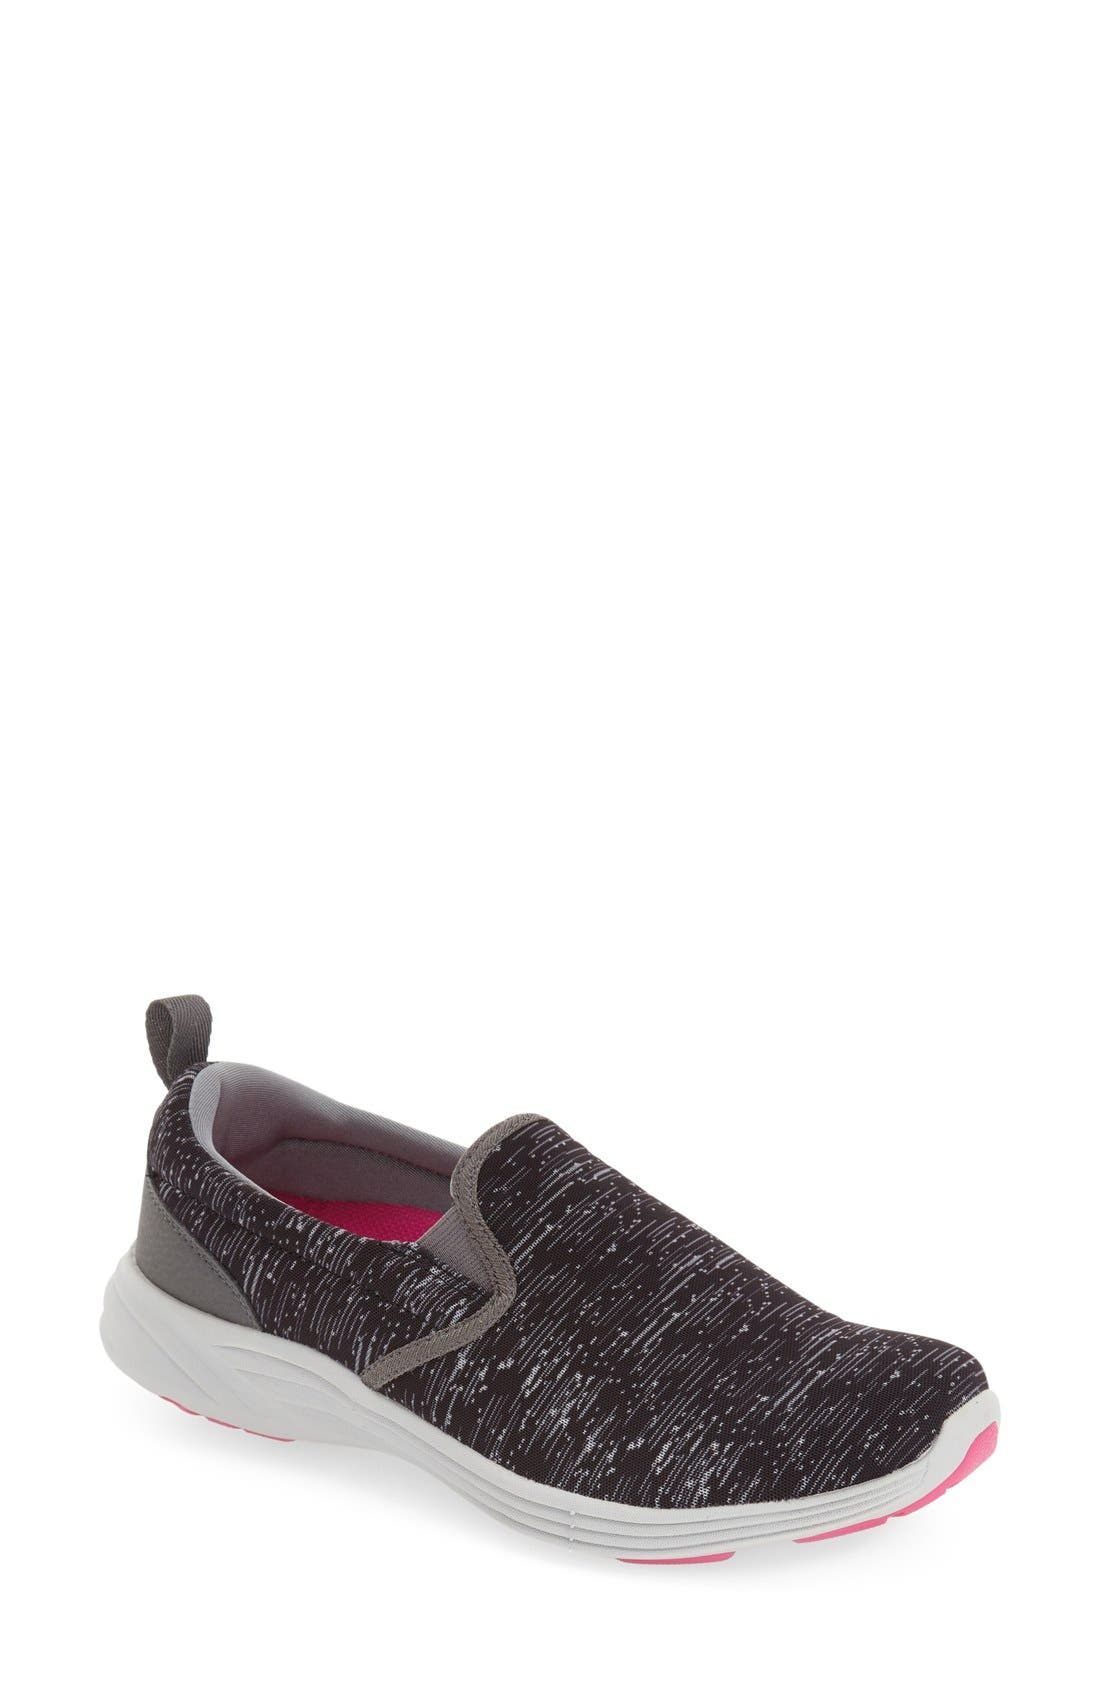 'Kea' Slip-On Sneaker,                             Main thumbnail 1, color,                             Black Fabric